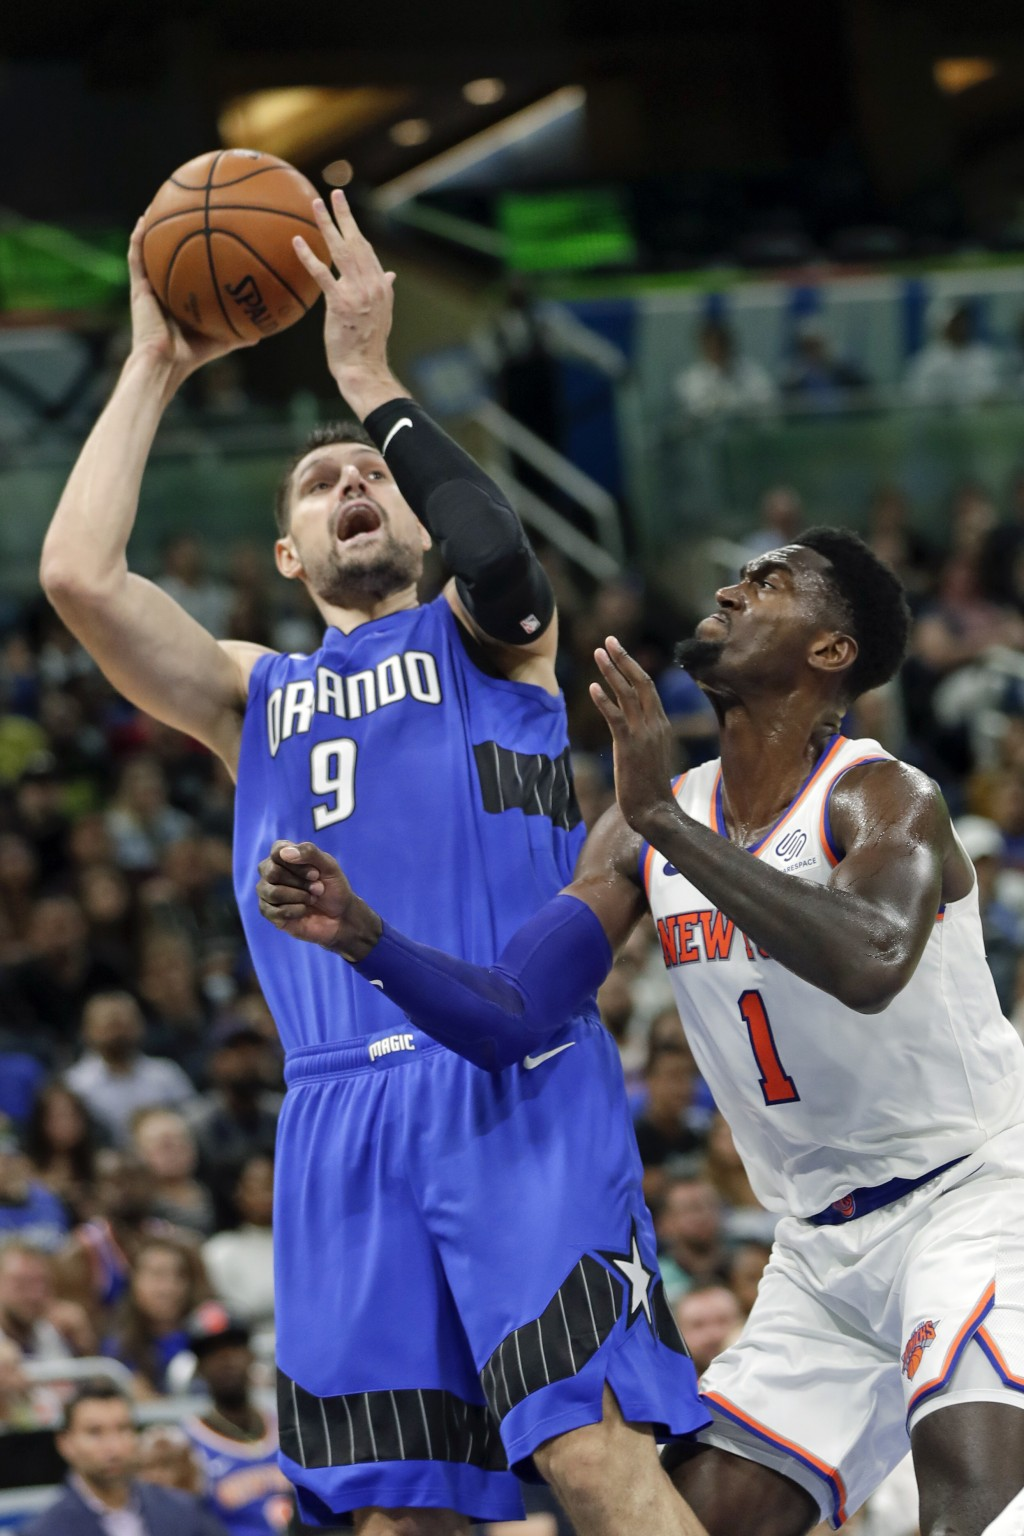 Orlando Magic's Nikola Vucevic (9) takes a shot over New York Knicks' Bobby Portis (1) during the second half of an NBA basketball game, Wednesday, Oc...